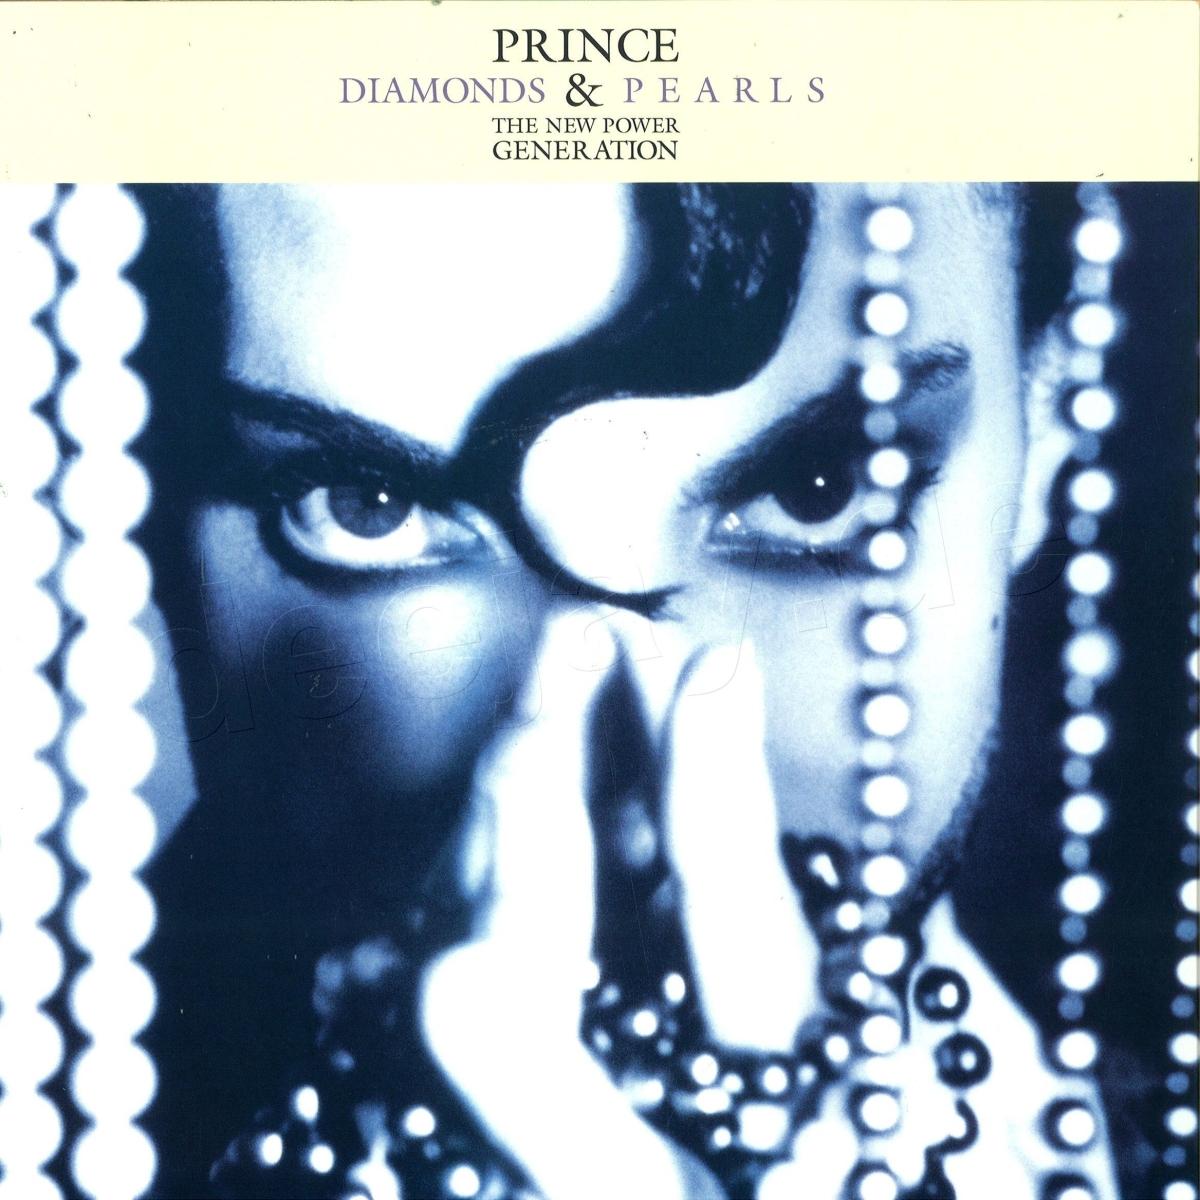 「prince diamonds and pearls」の画像検索結果